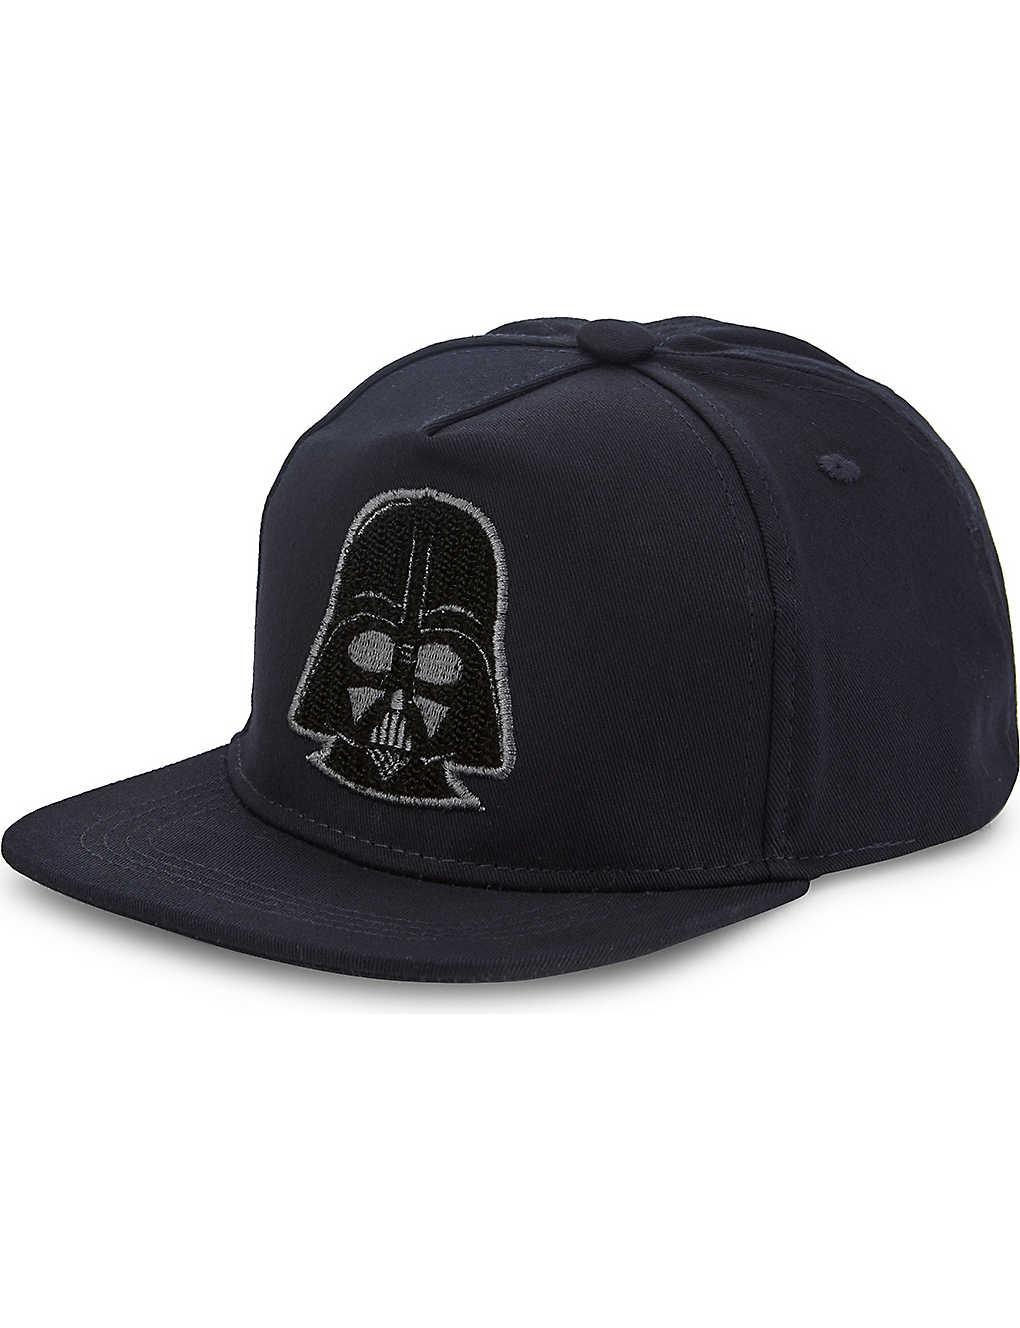 FABRIC FLAVOURS - Darth Vader cotton snapback cap  0617a8e08546